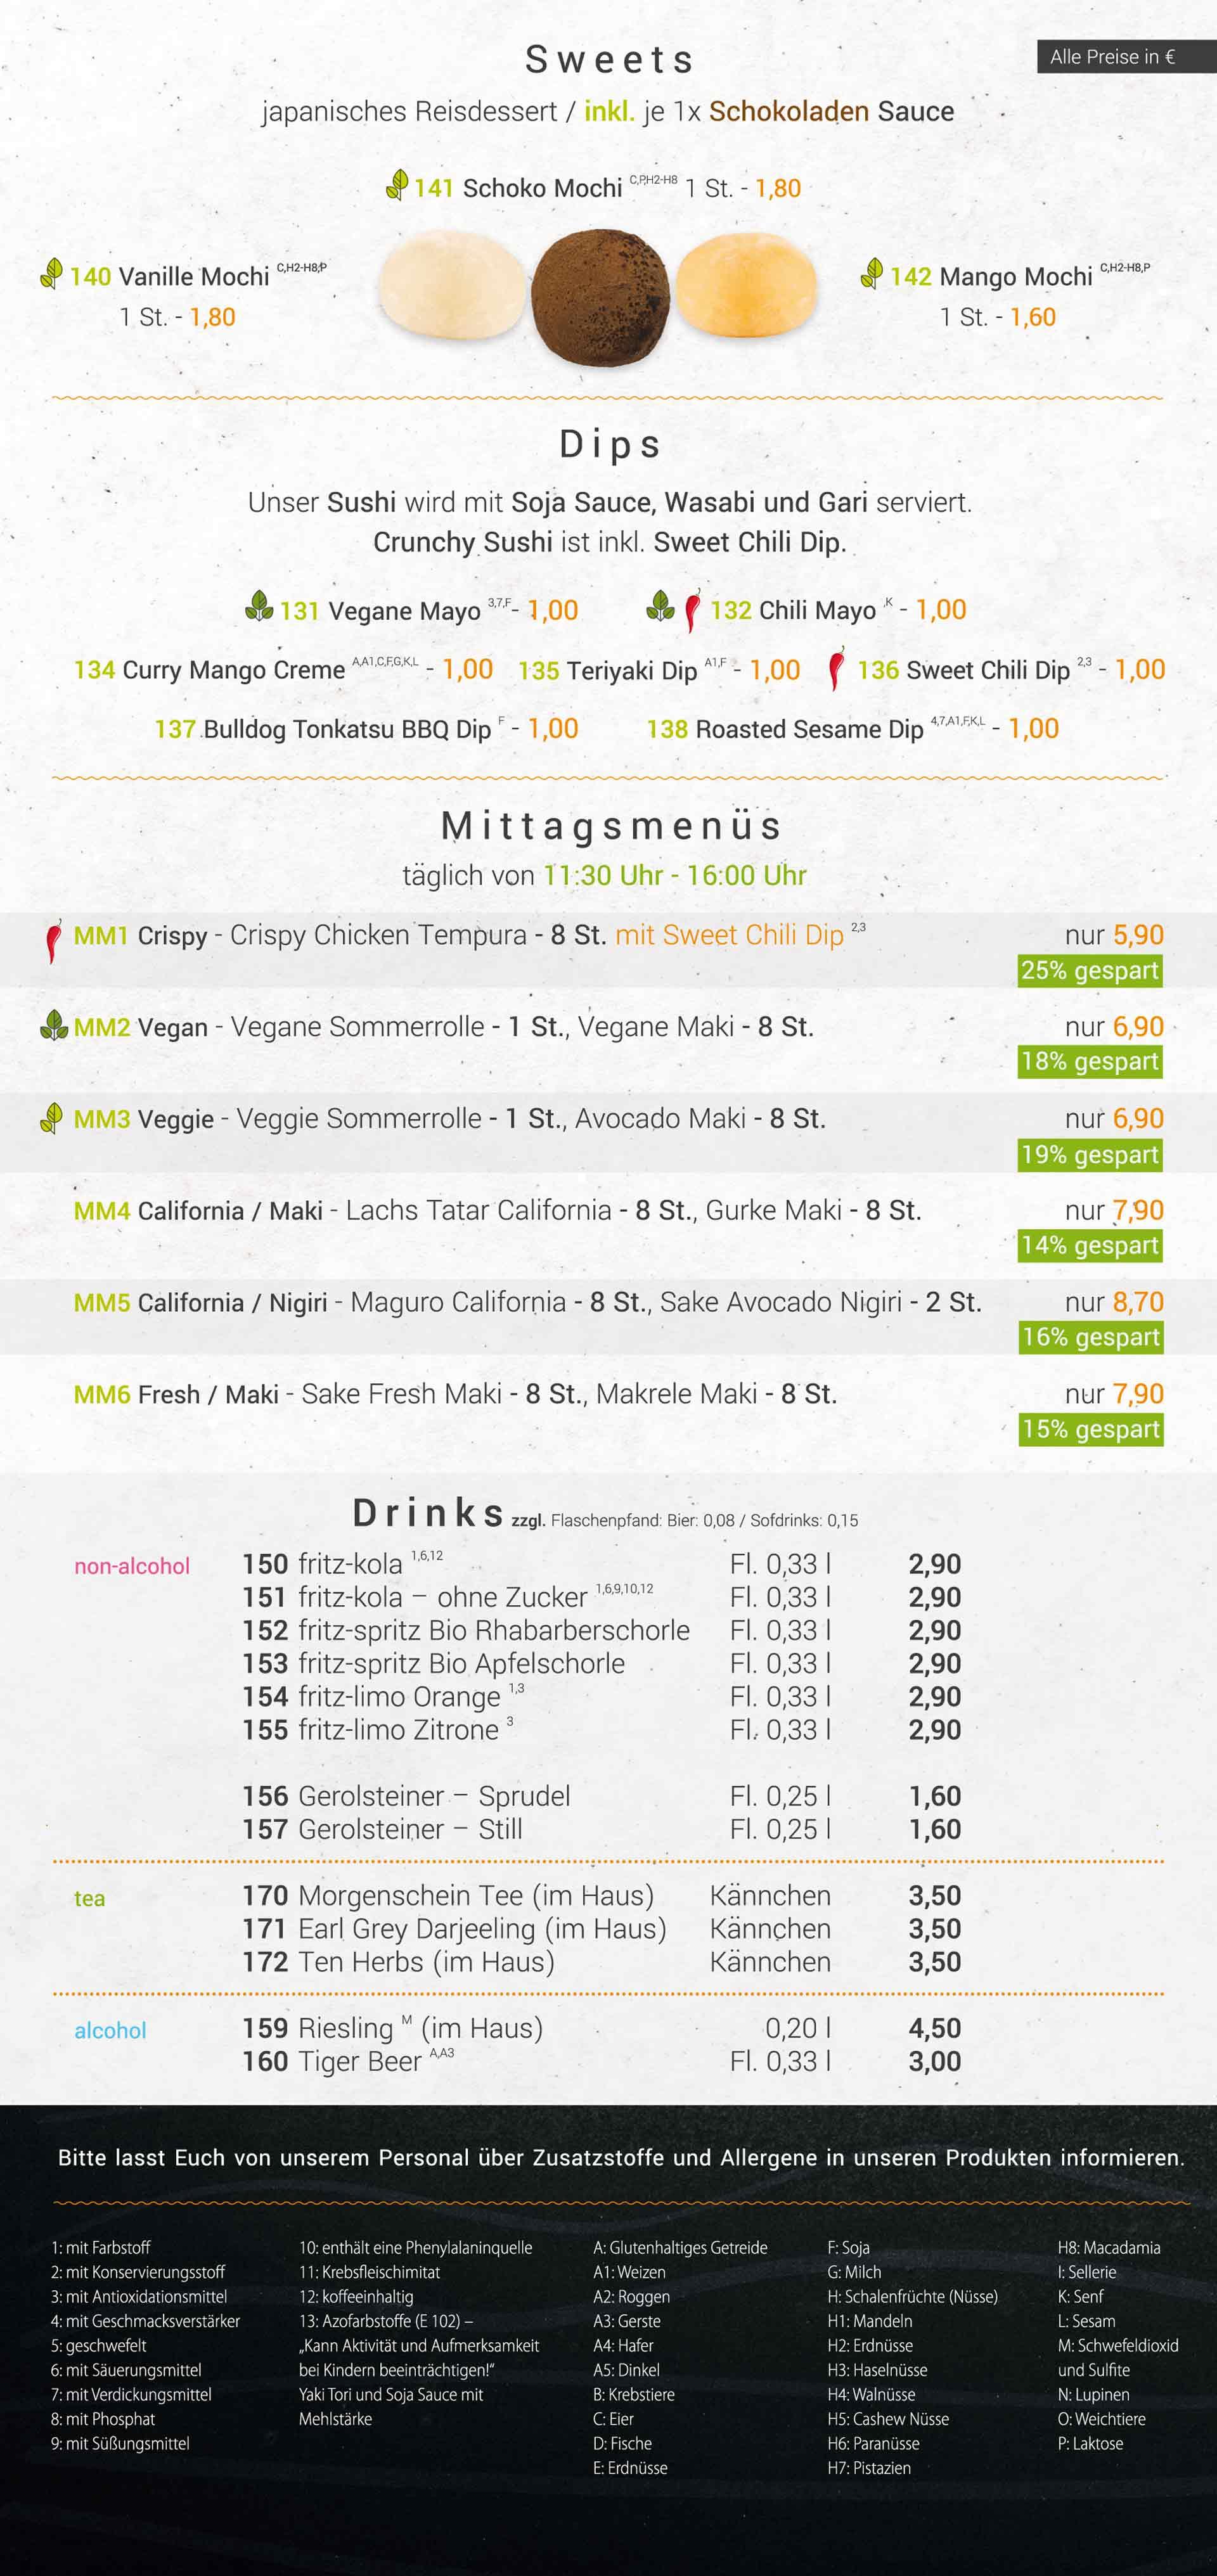 Speisekarte Sushideluxe Magdeburg Seite 5 | Sweets, Dips, Mittags Menues, Drinks